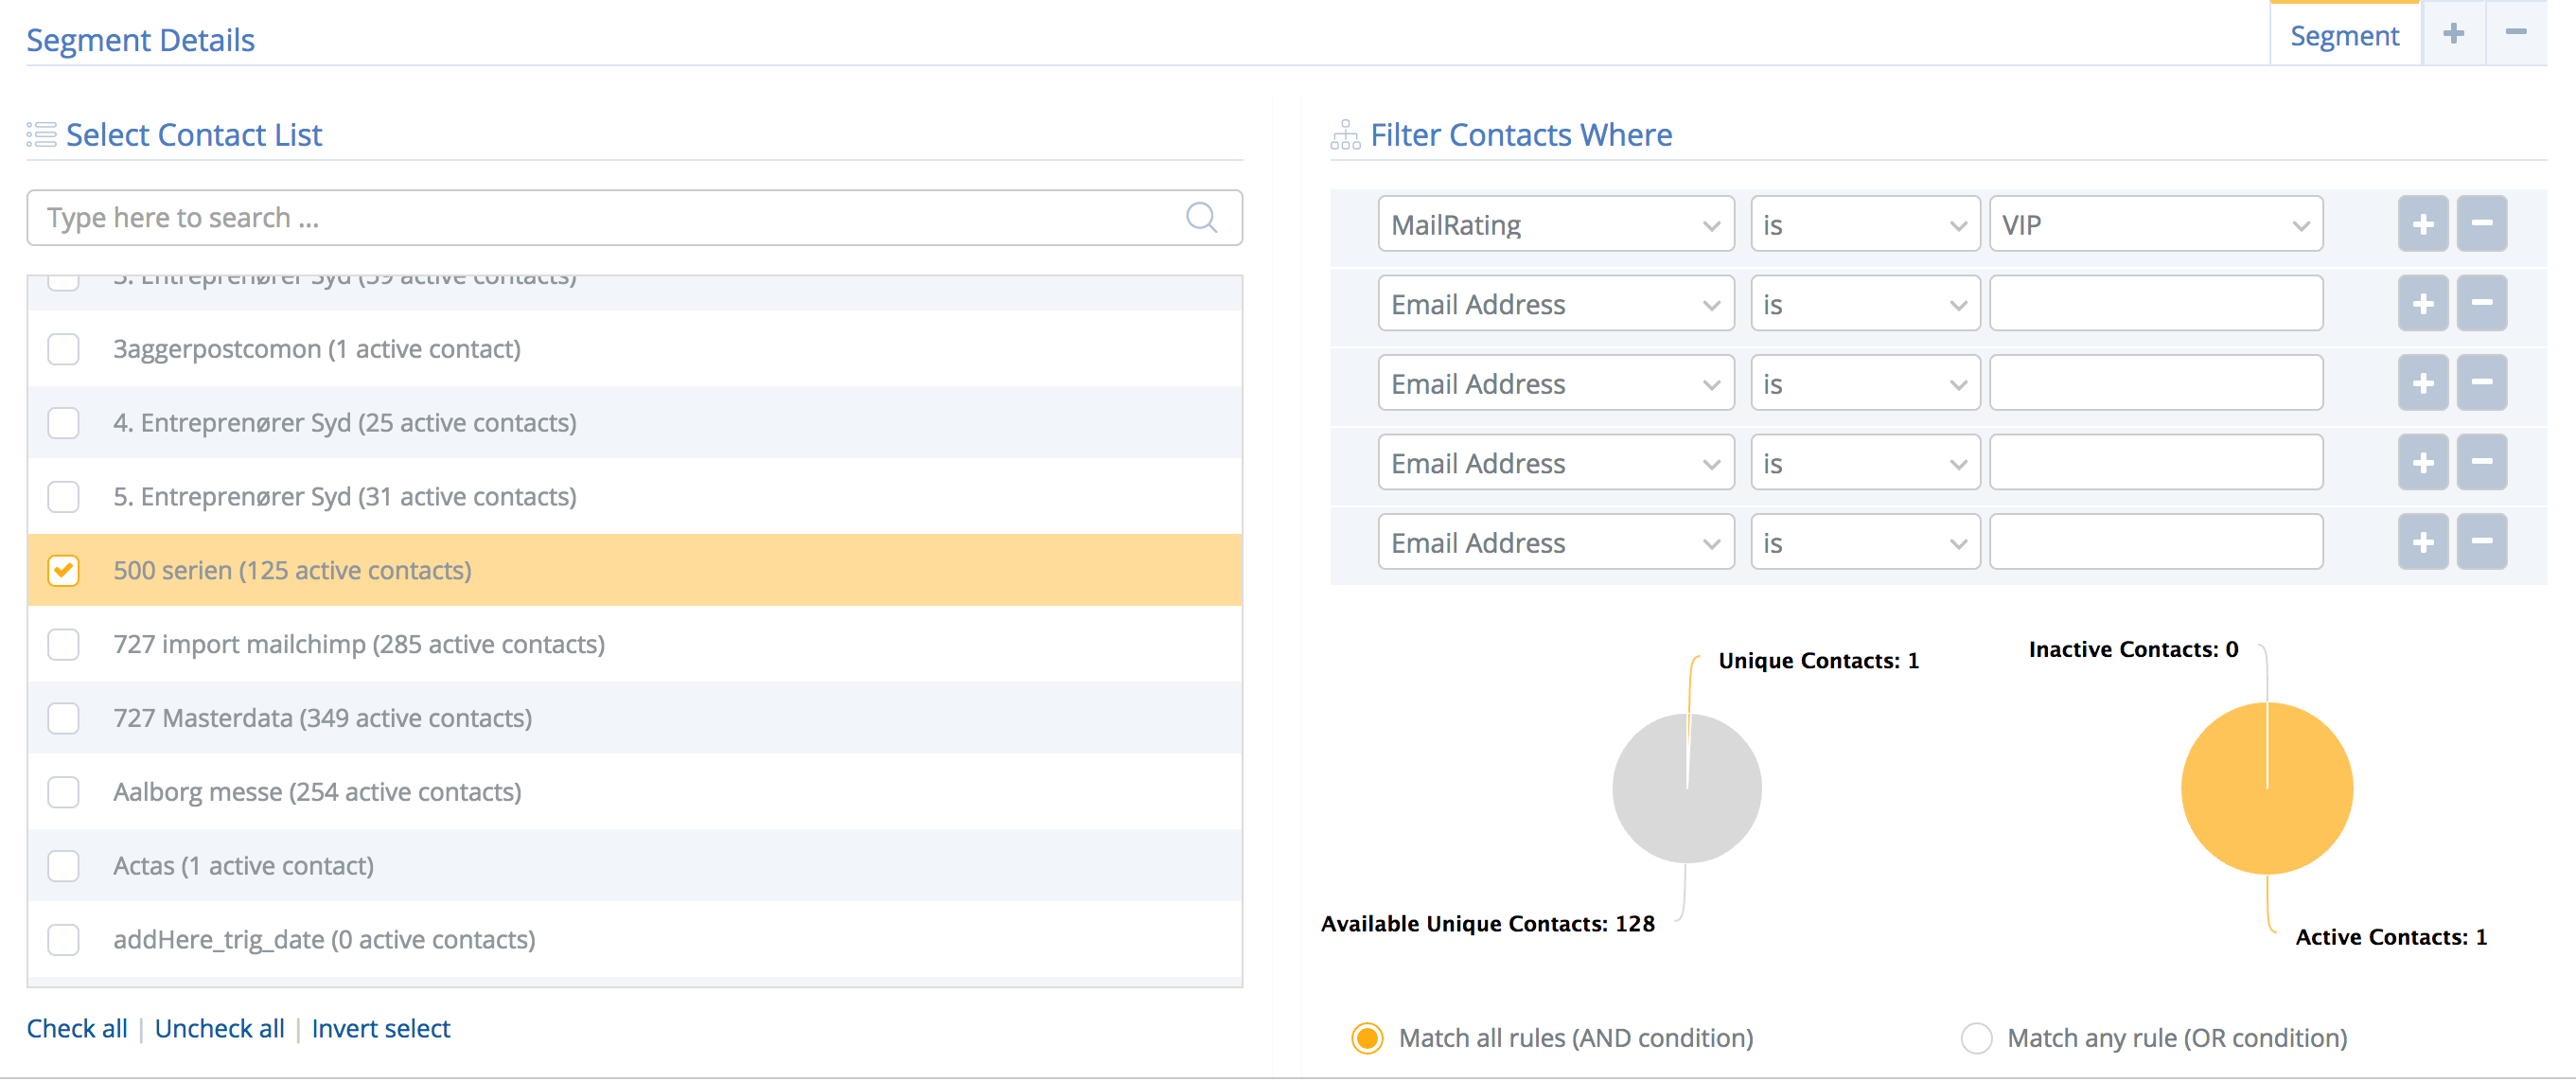 segmenter-mailplatform-combinedsegments